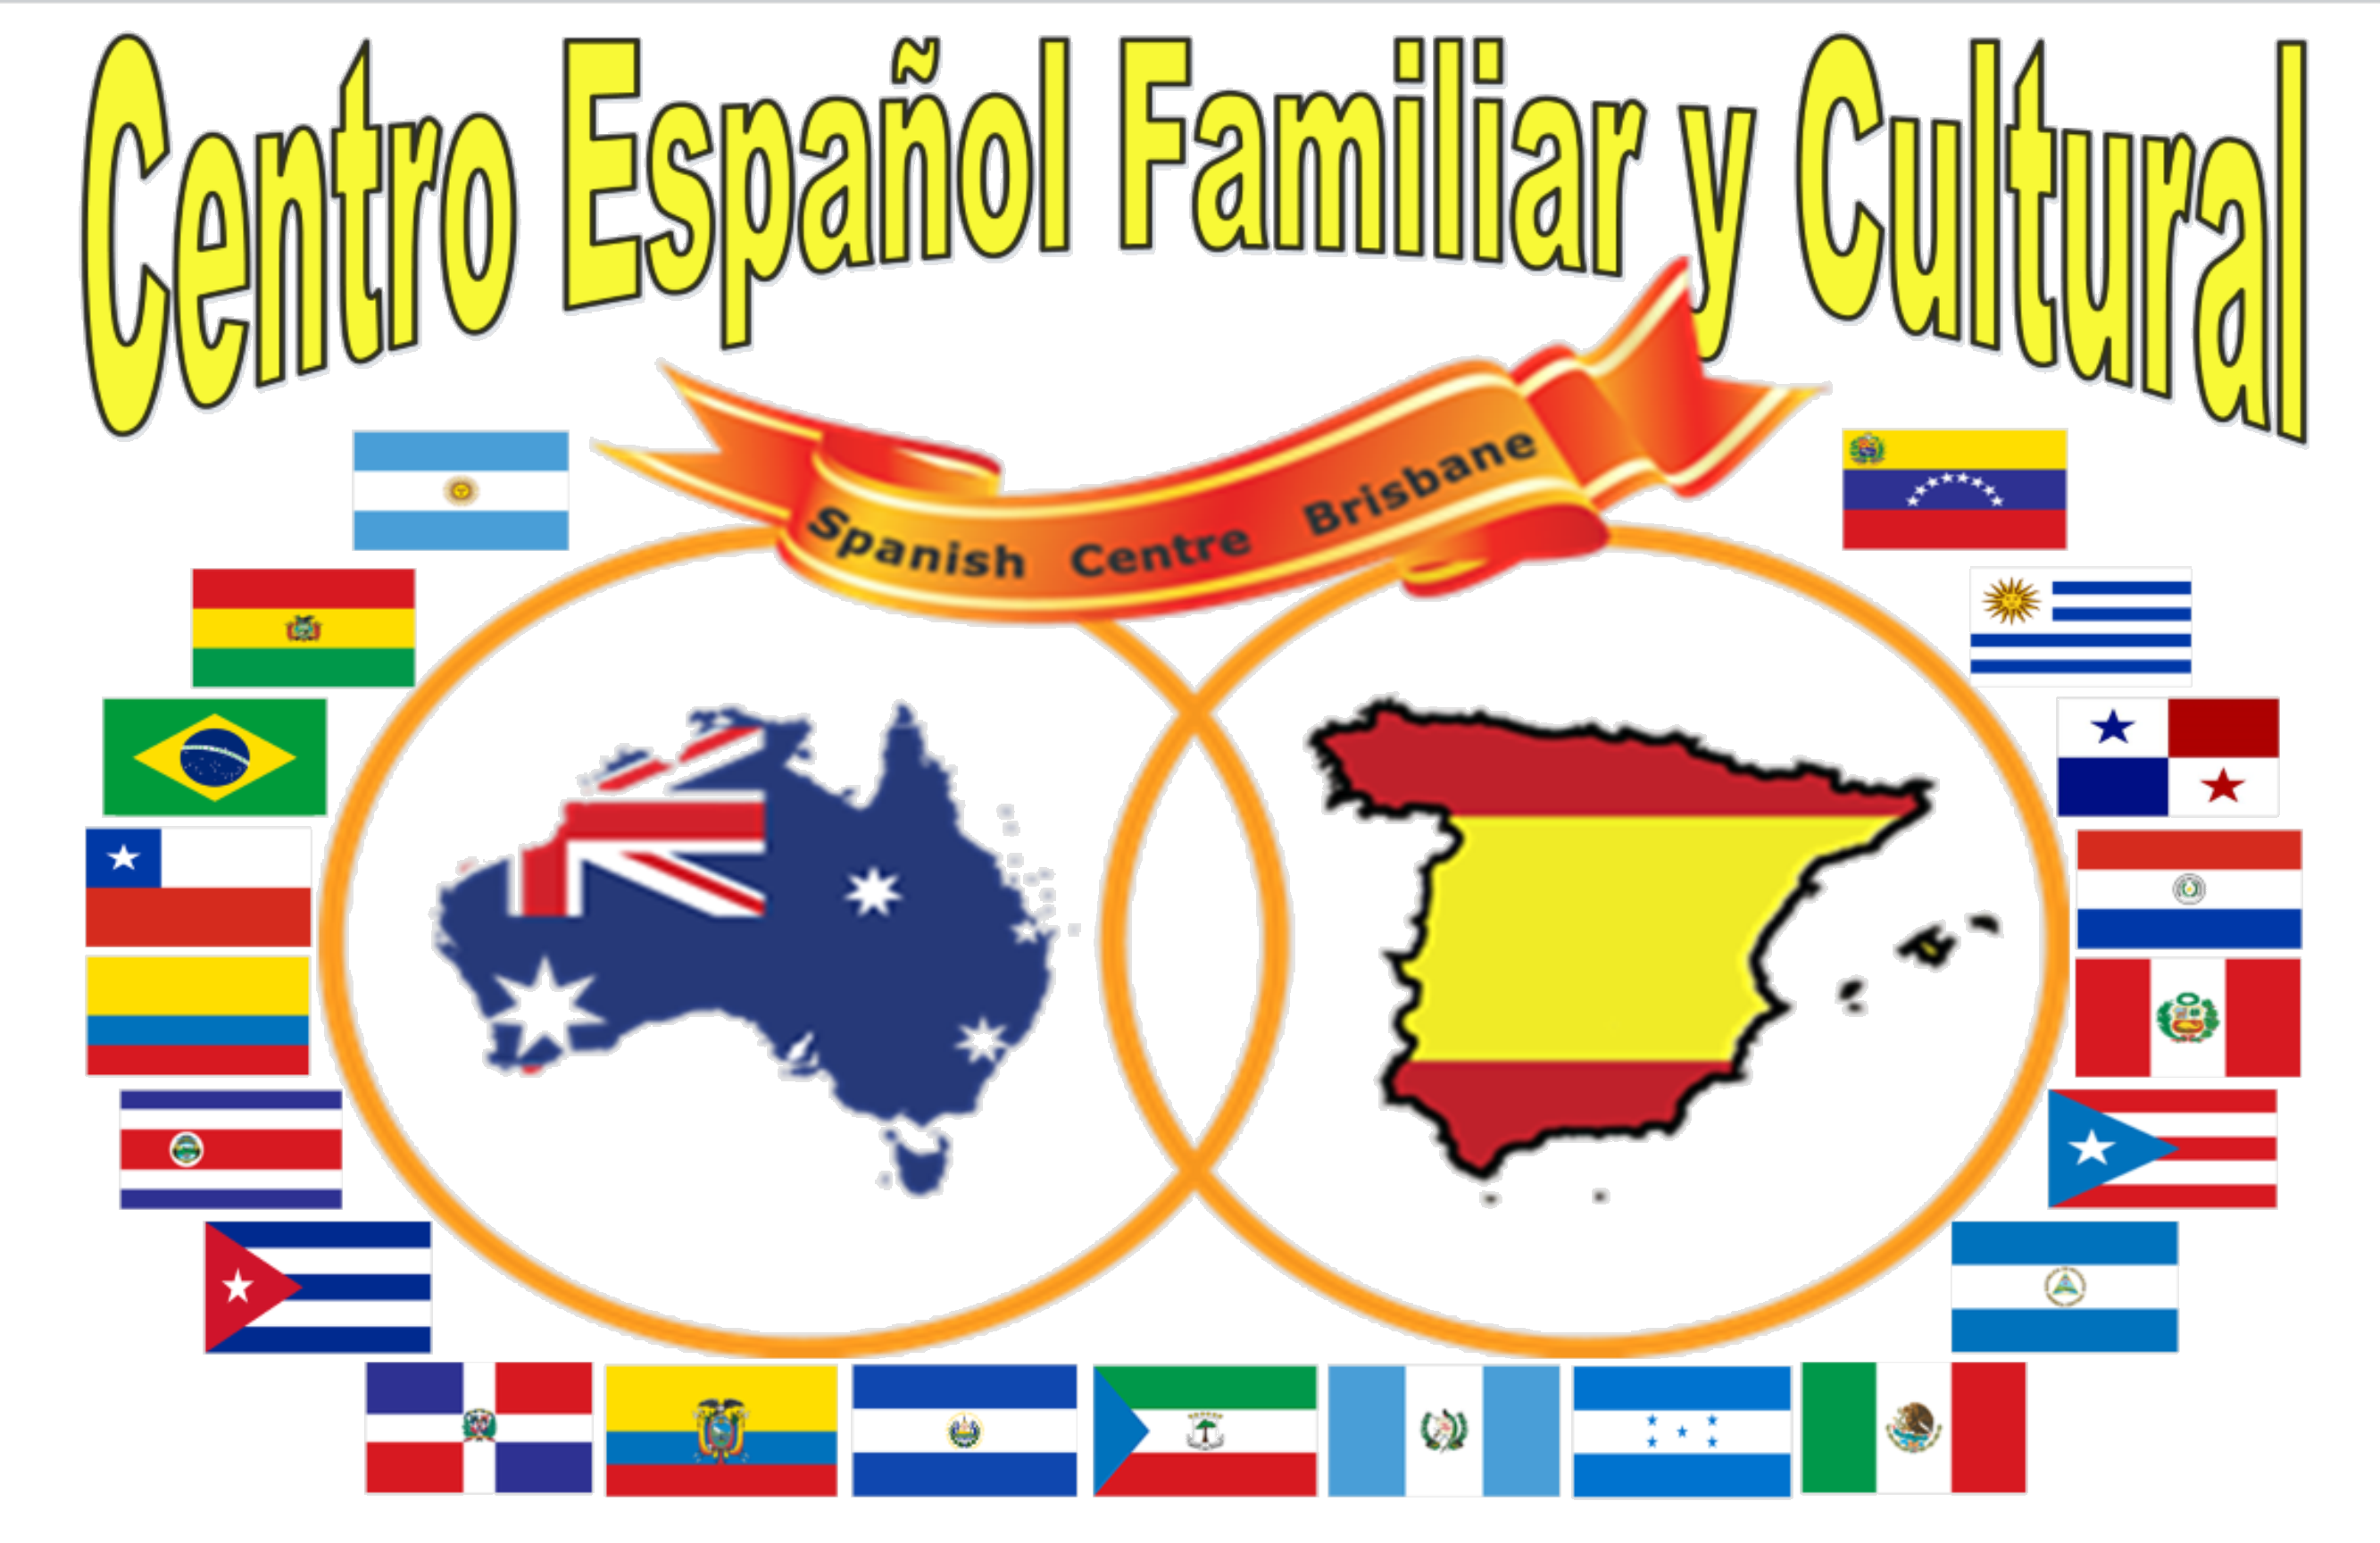 Spanish Centre